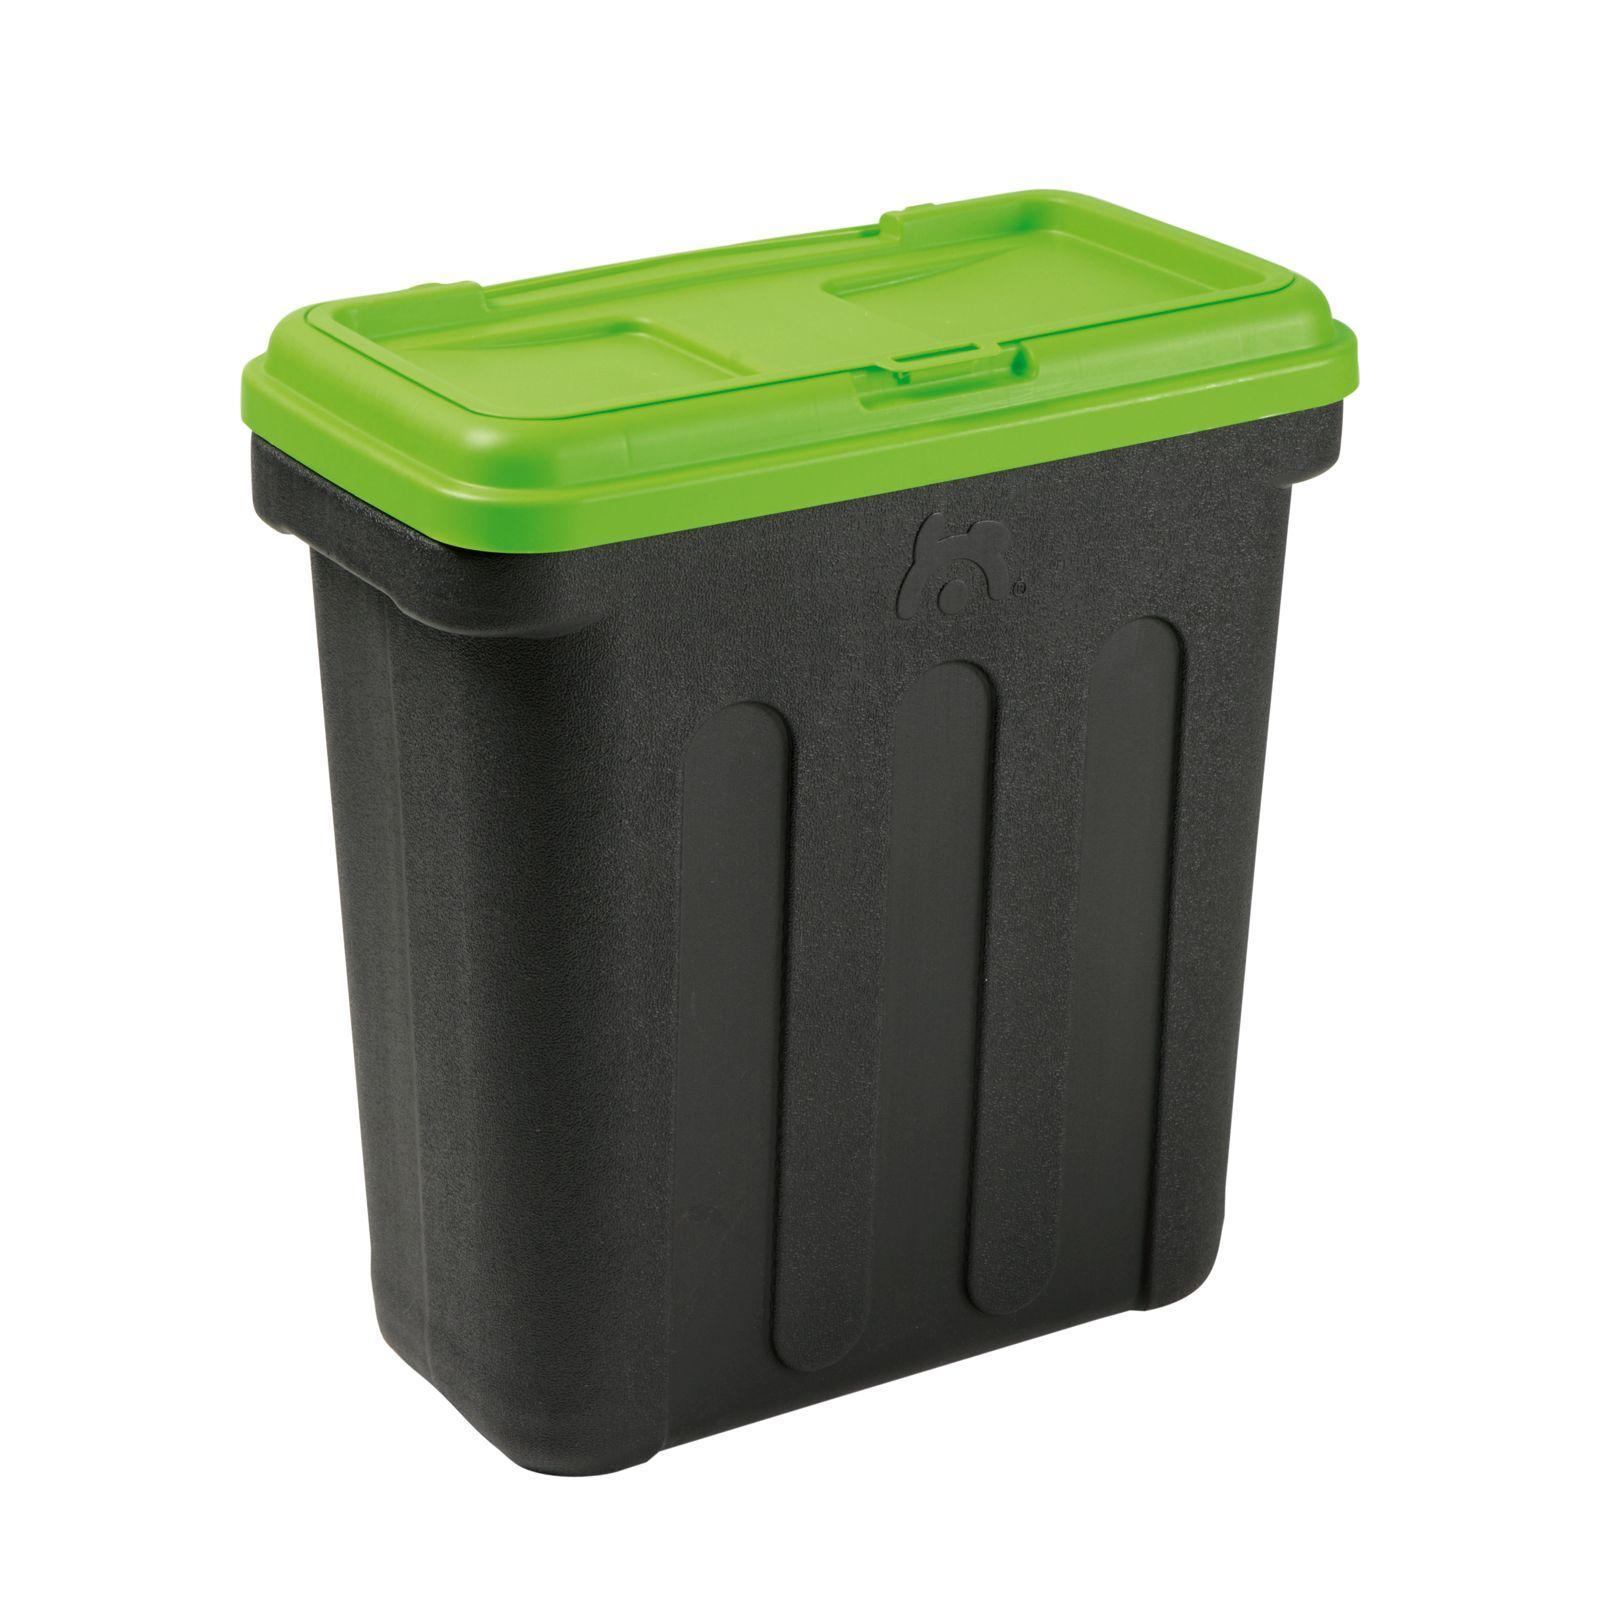 Maelson box na granule - černá / zelená - 54 x 31 x 58 cm